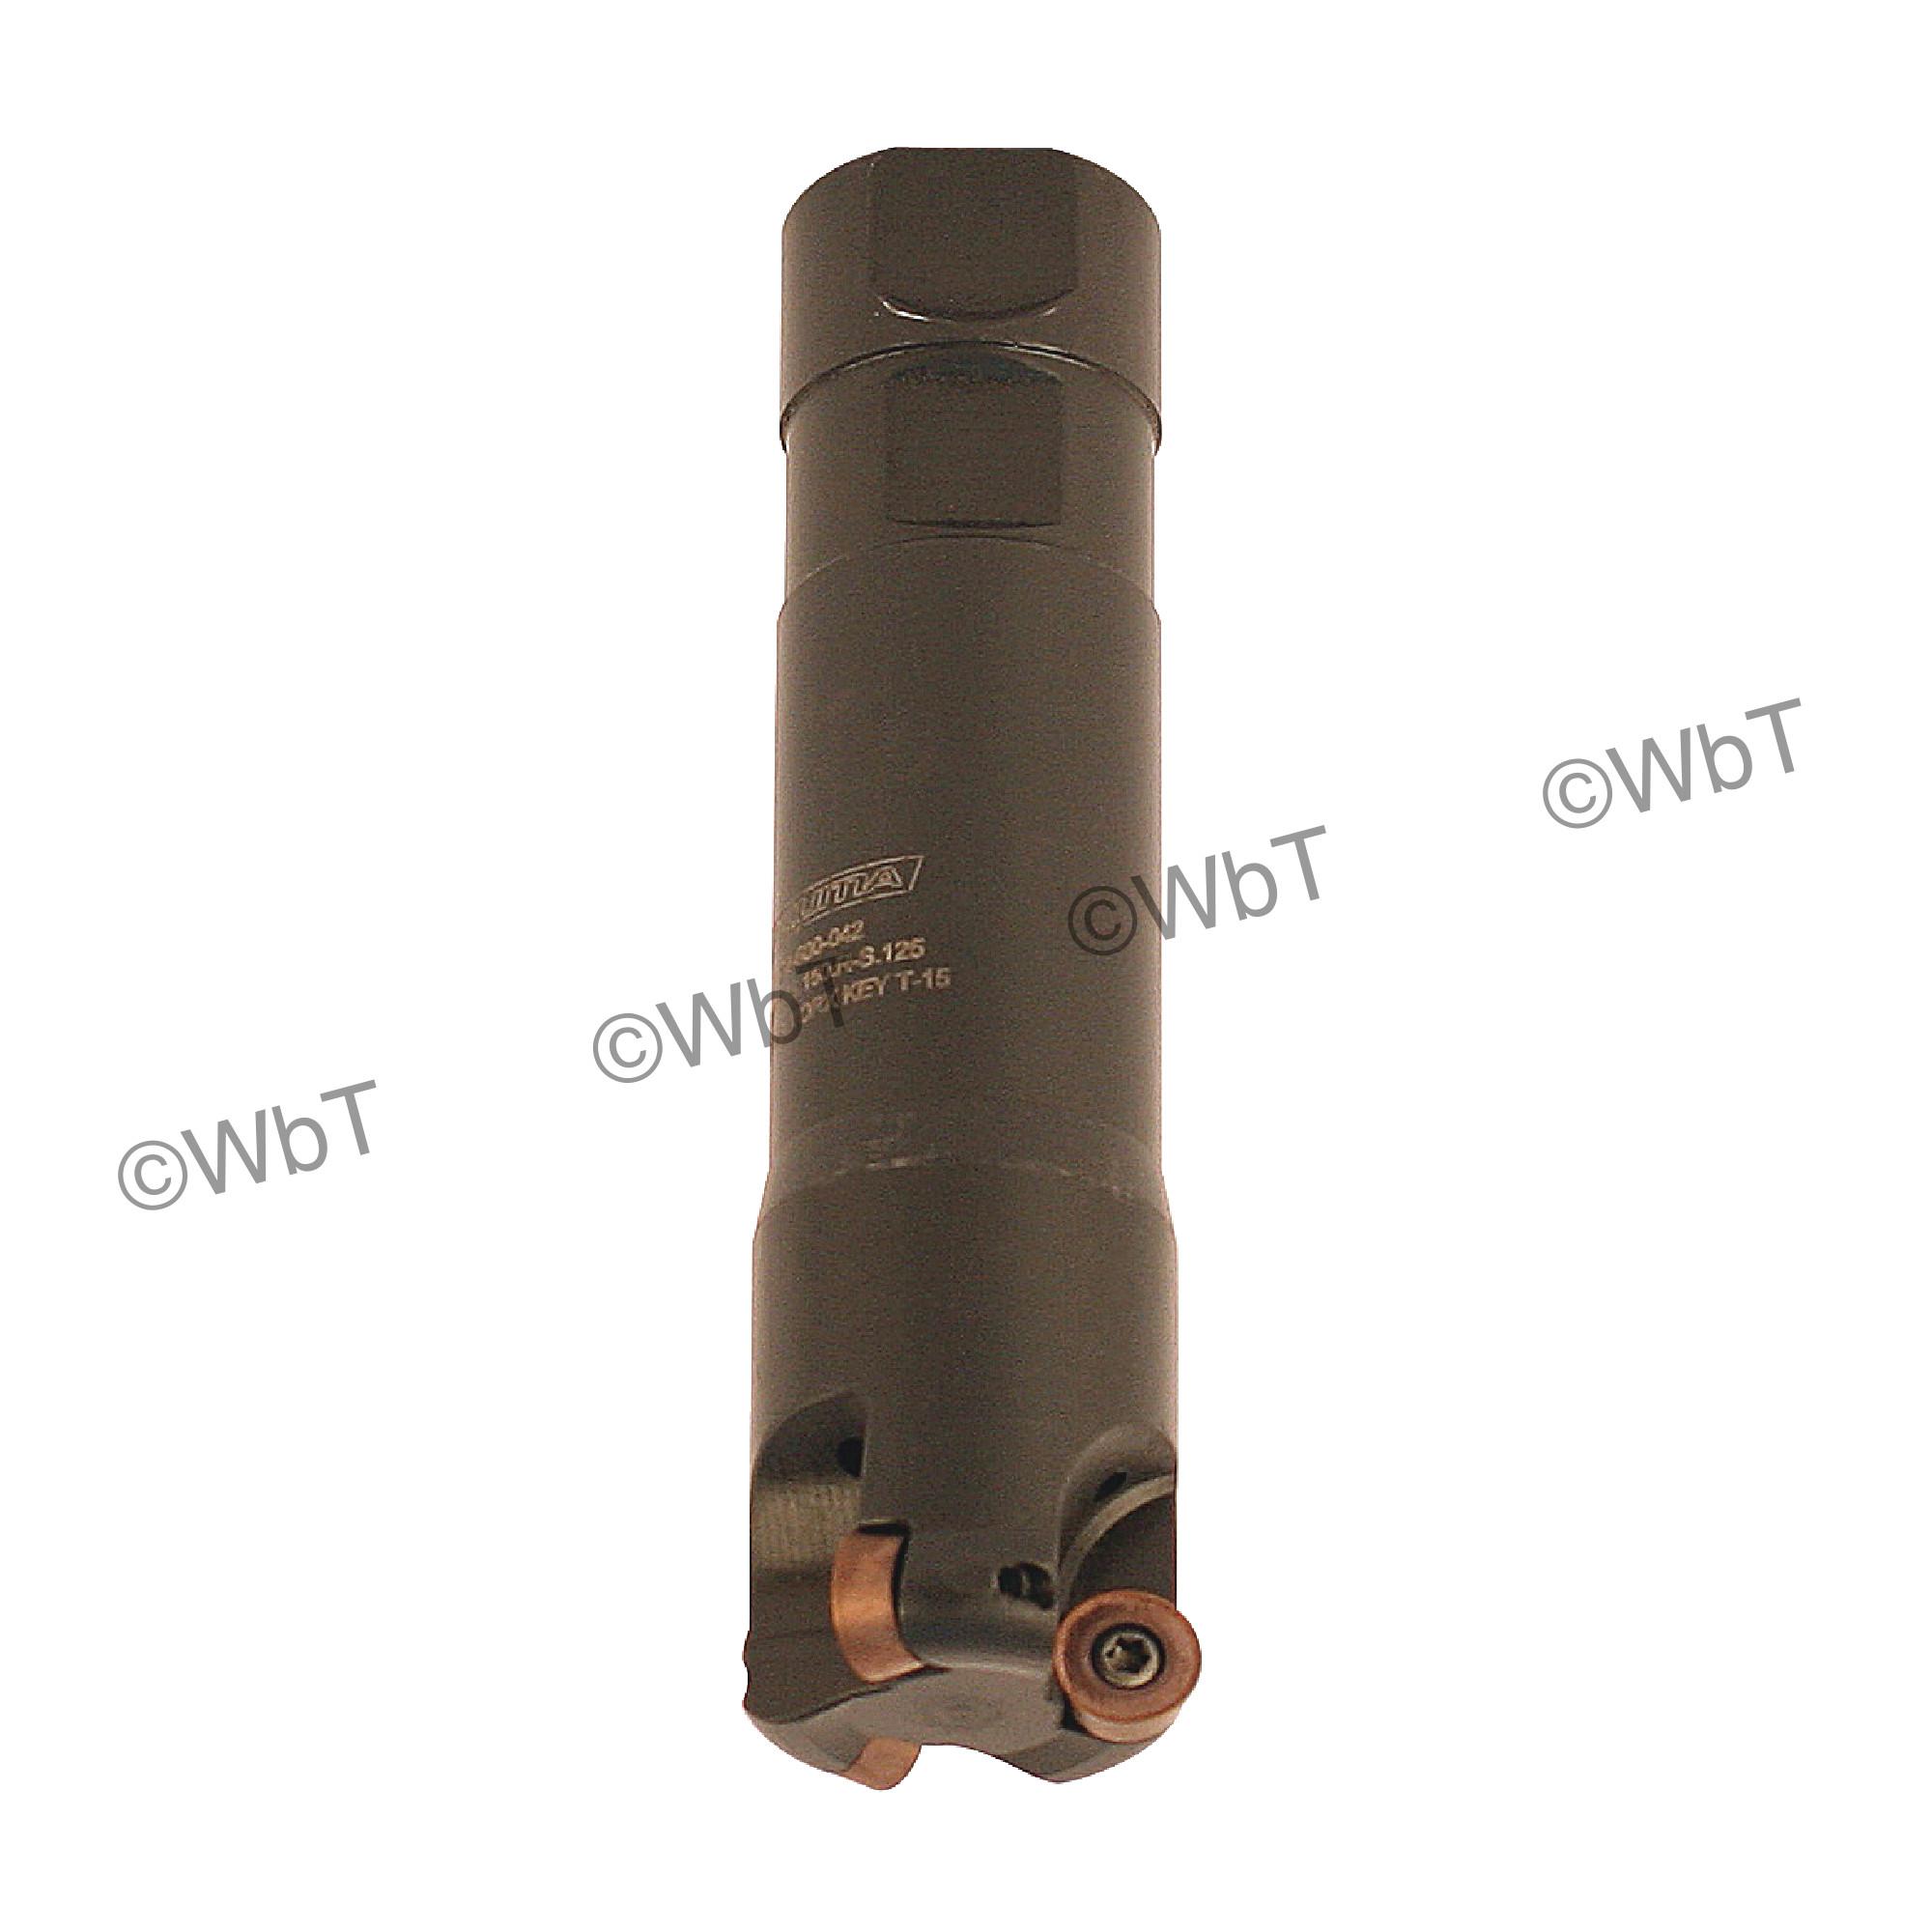 "AKUMA - 1.500"" Endmill Set / Includes: (1) RPS.43.150.R-S.125 (1.5""ø) & (10) RPMT1204M0S-M1 PM15M Coated Inserts"